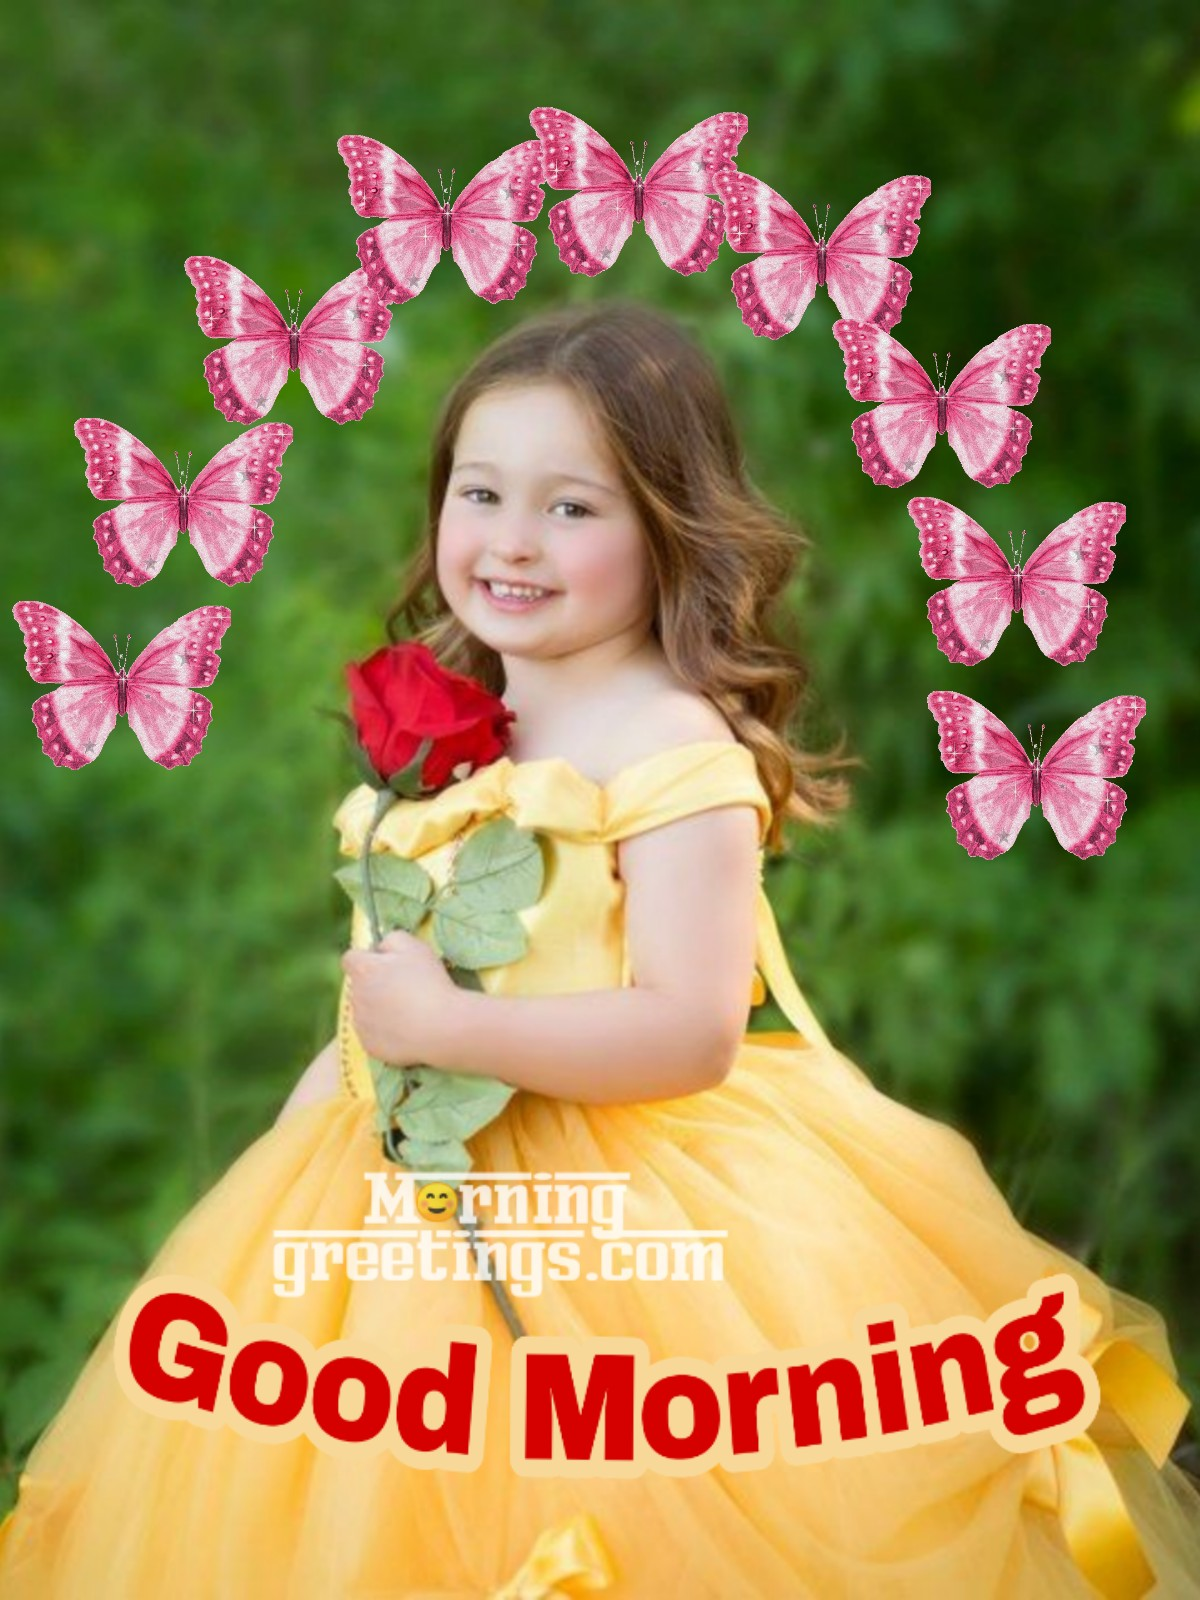 30 Good Morning Beautiful Girls Morning Greetings Morning Wishes